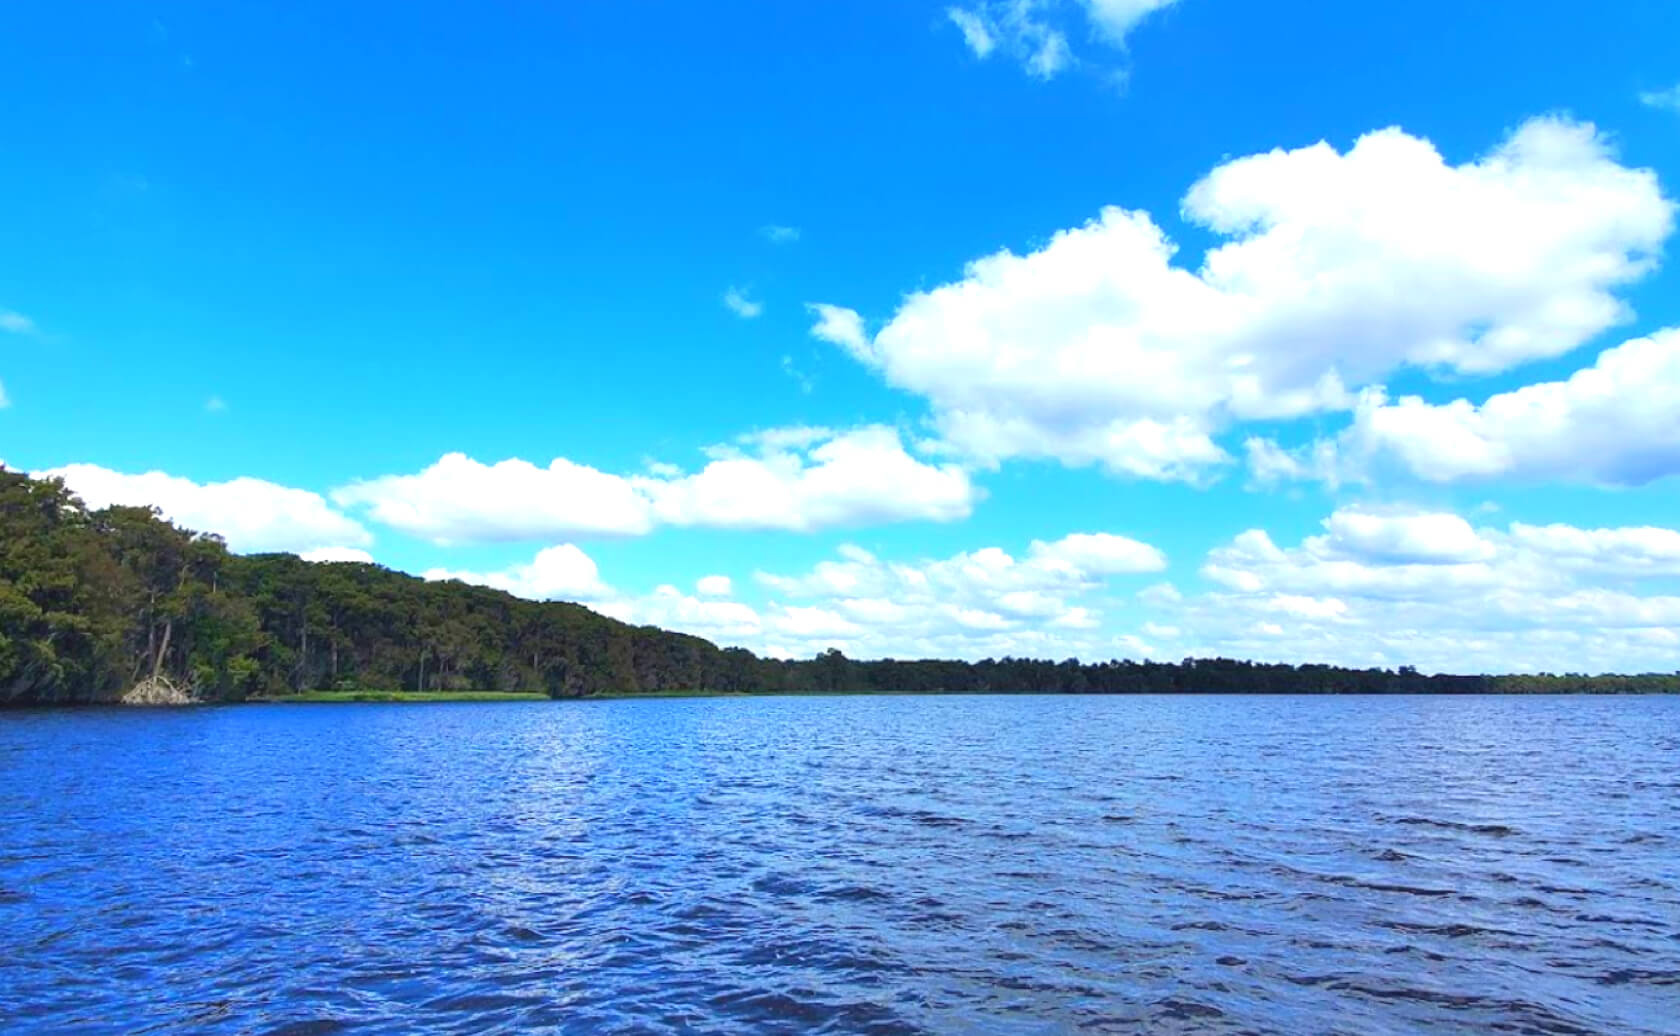 Newnans-Lake-Fishing-Guide-Report-Florida-02